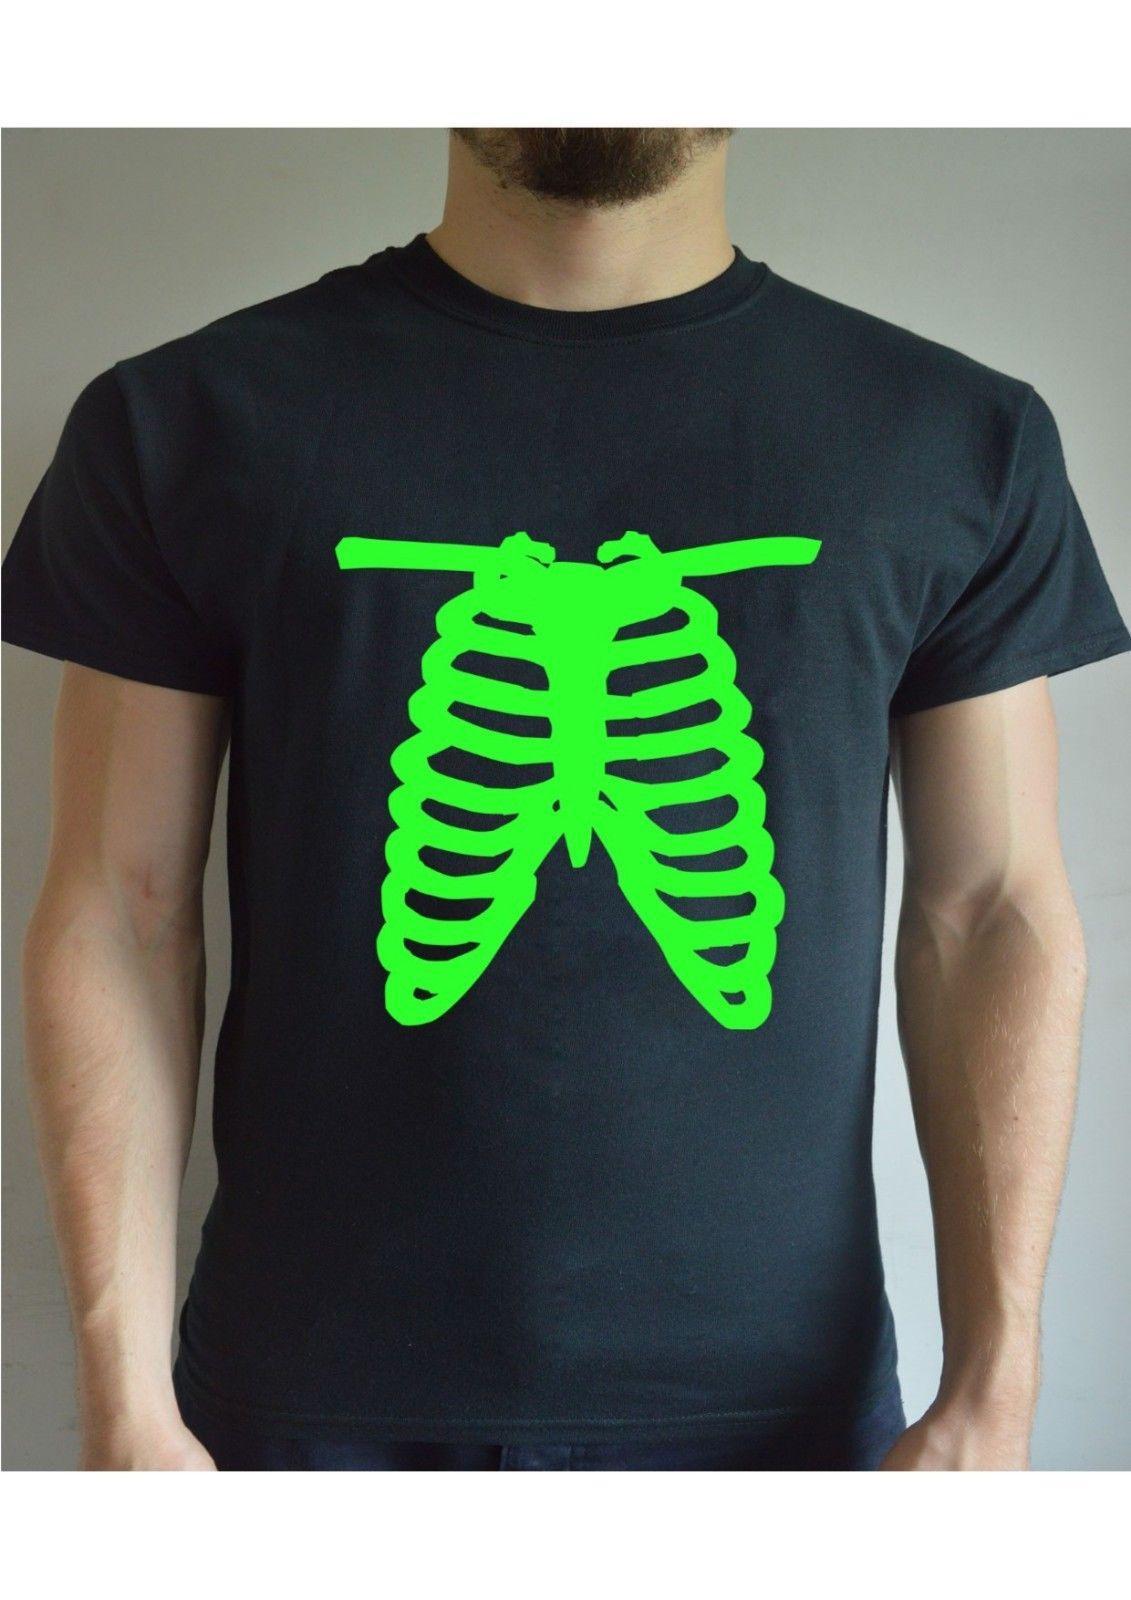 c81af3f5 Skeleton Ribs Fluorescent Printed T Shirt Funny Joke Gift Present Mens Crew  100% Cotton Casual Printing Short Sleeve Men T Shirt Print Shirts Print T  Shirt ...